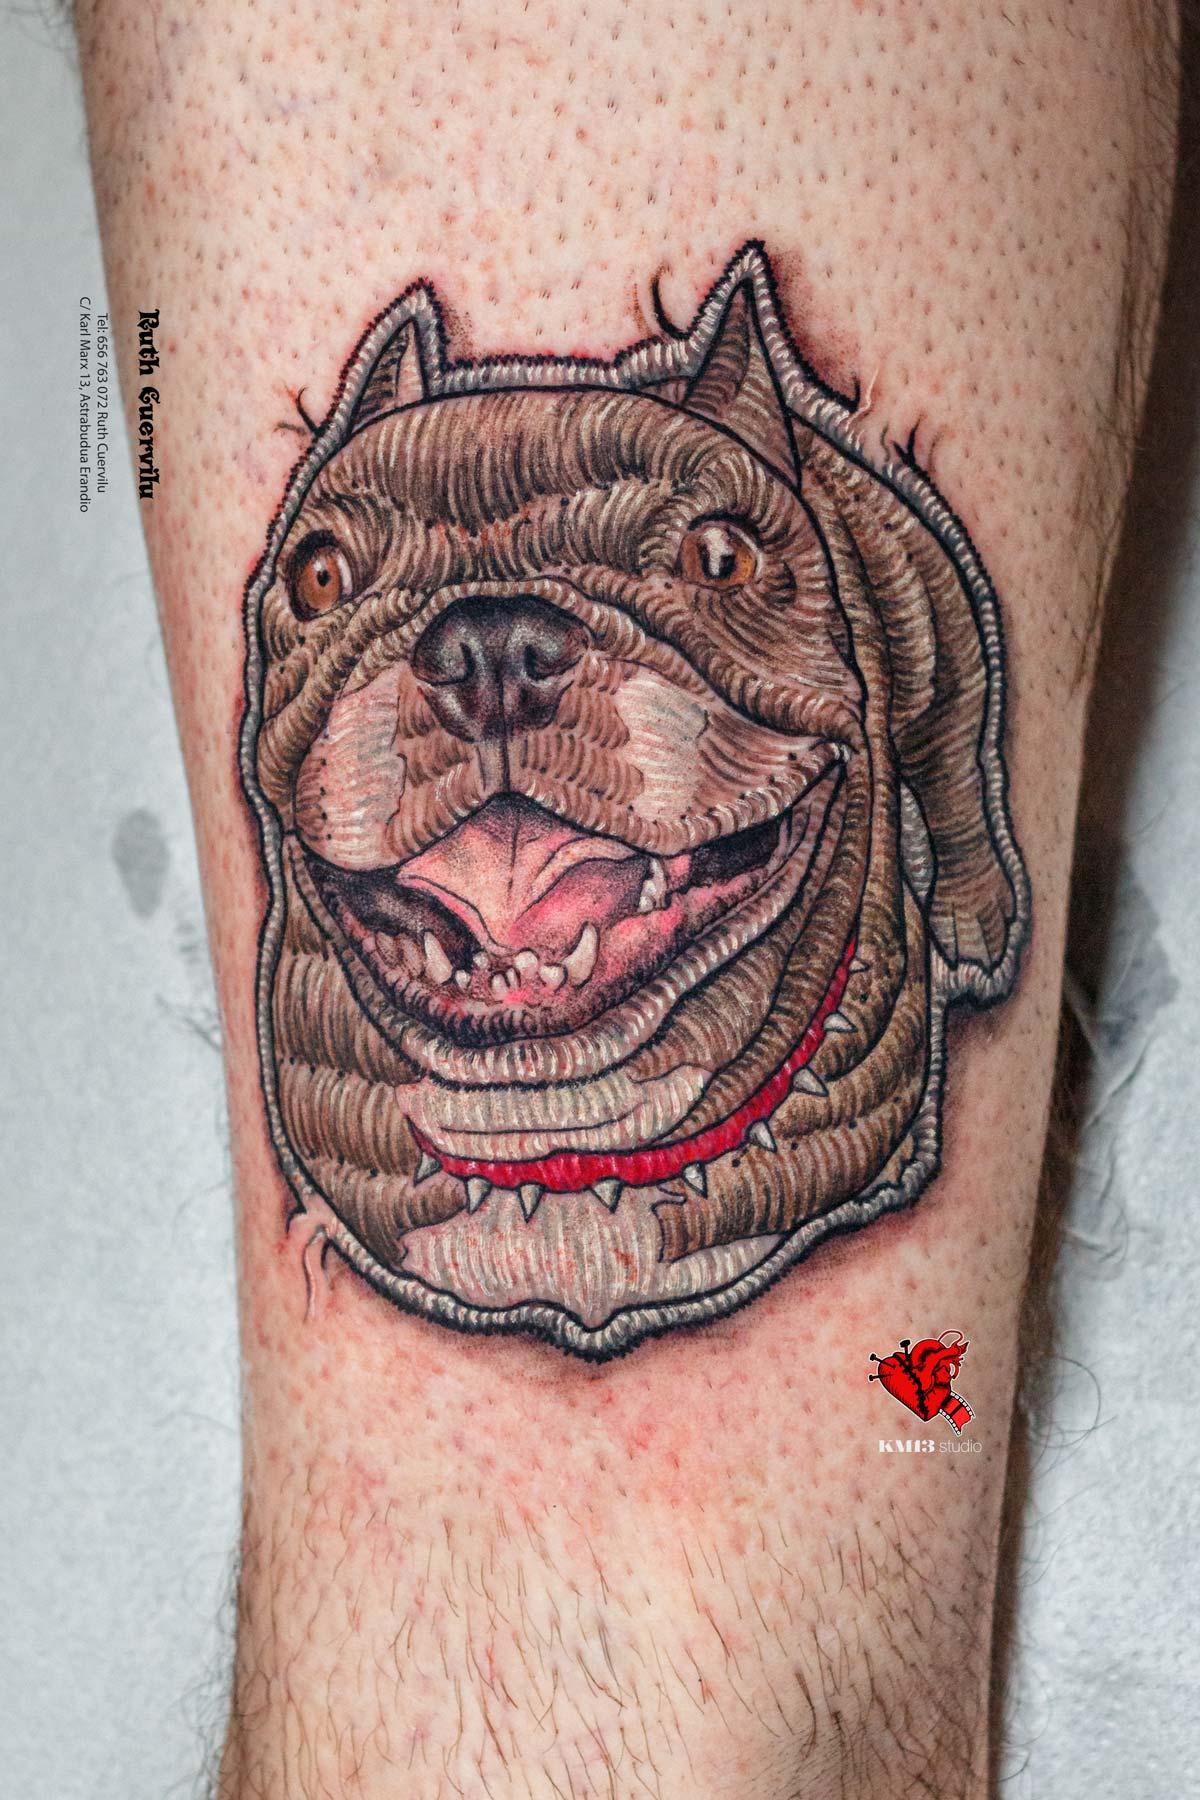 Tatuaje mascota perro realismo Parche Bordado Maddi - Ruth Cuervilu Tattoo - KM13 Studio - estudio de tatuajes erandio astrabudua bilbao bizkaia